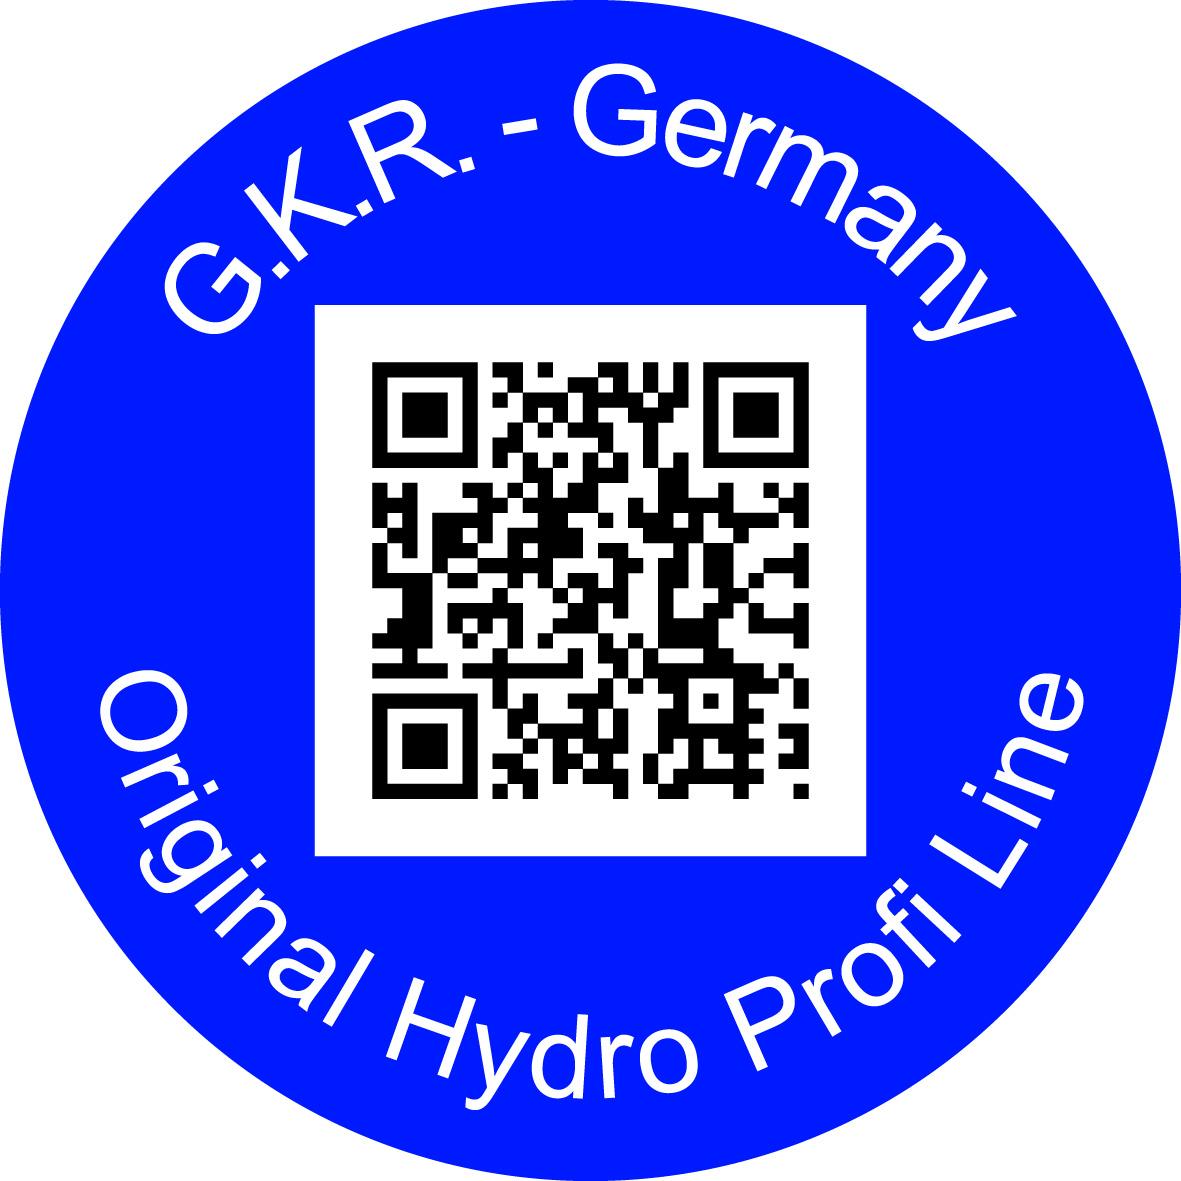 Hydro Profi Line Qualitätssiegel